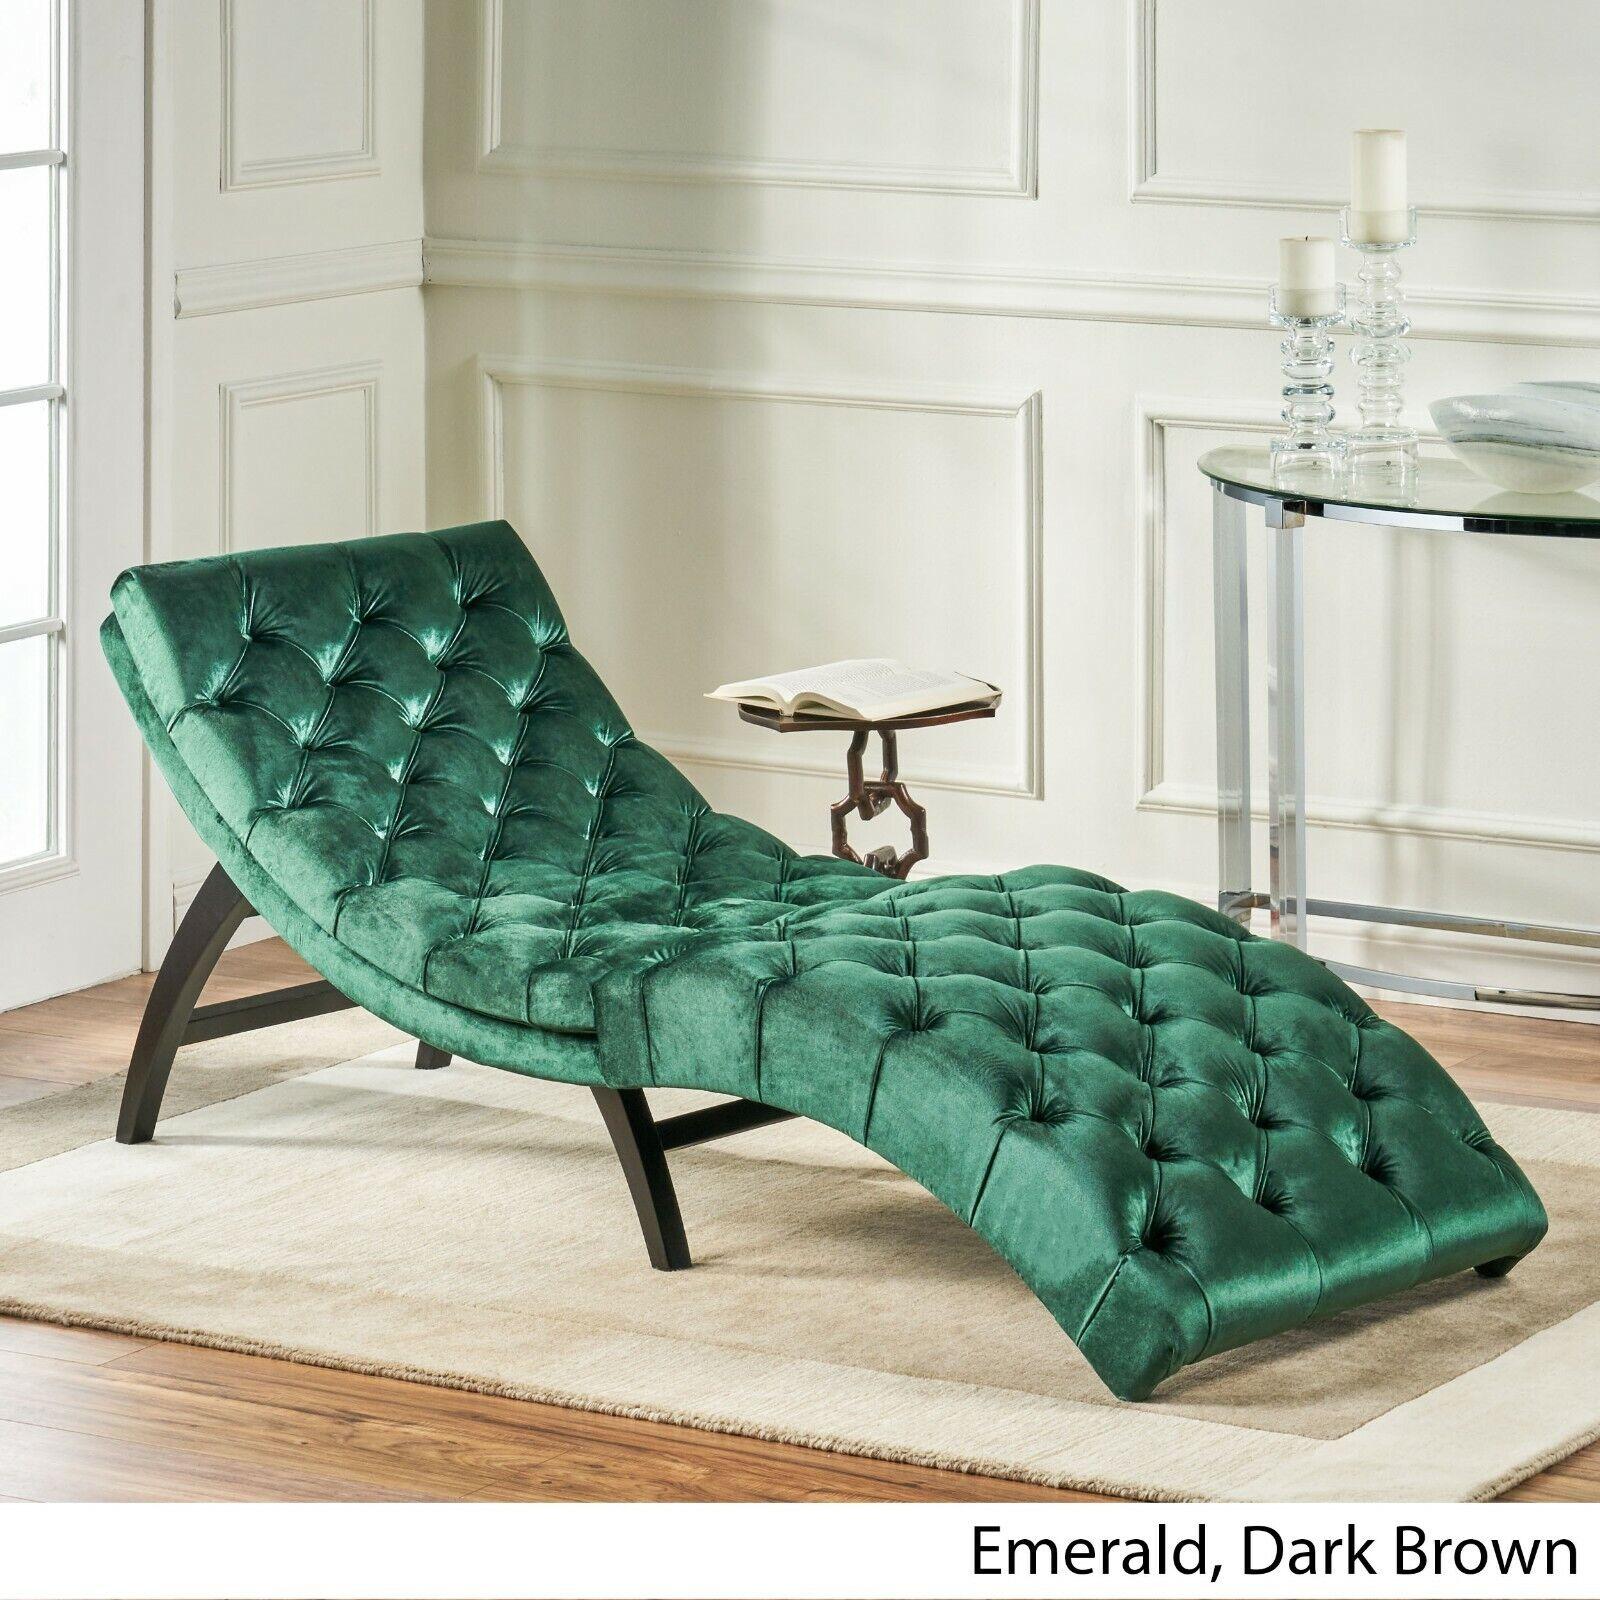 - Grasby Tufted New Velvet Chaise Lounge For Sale Online